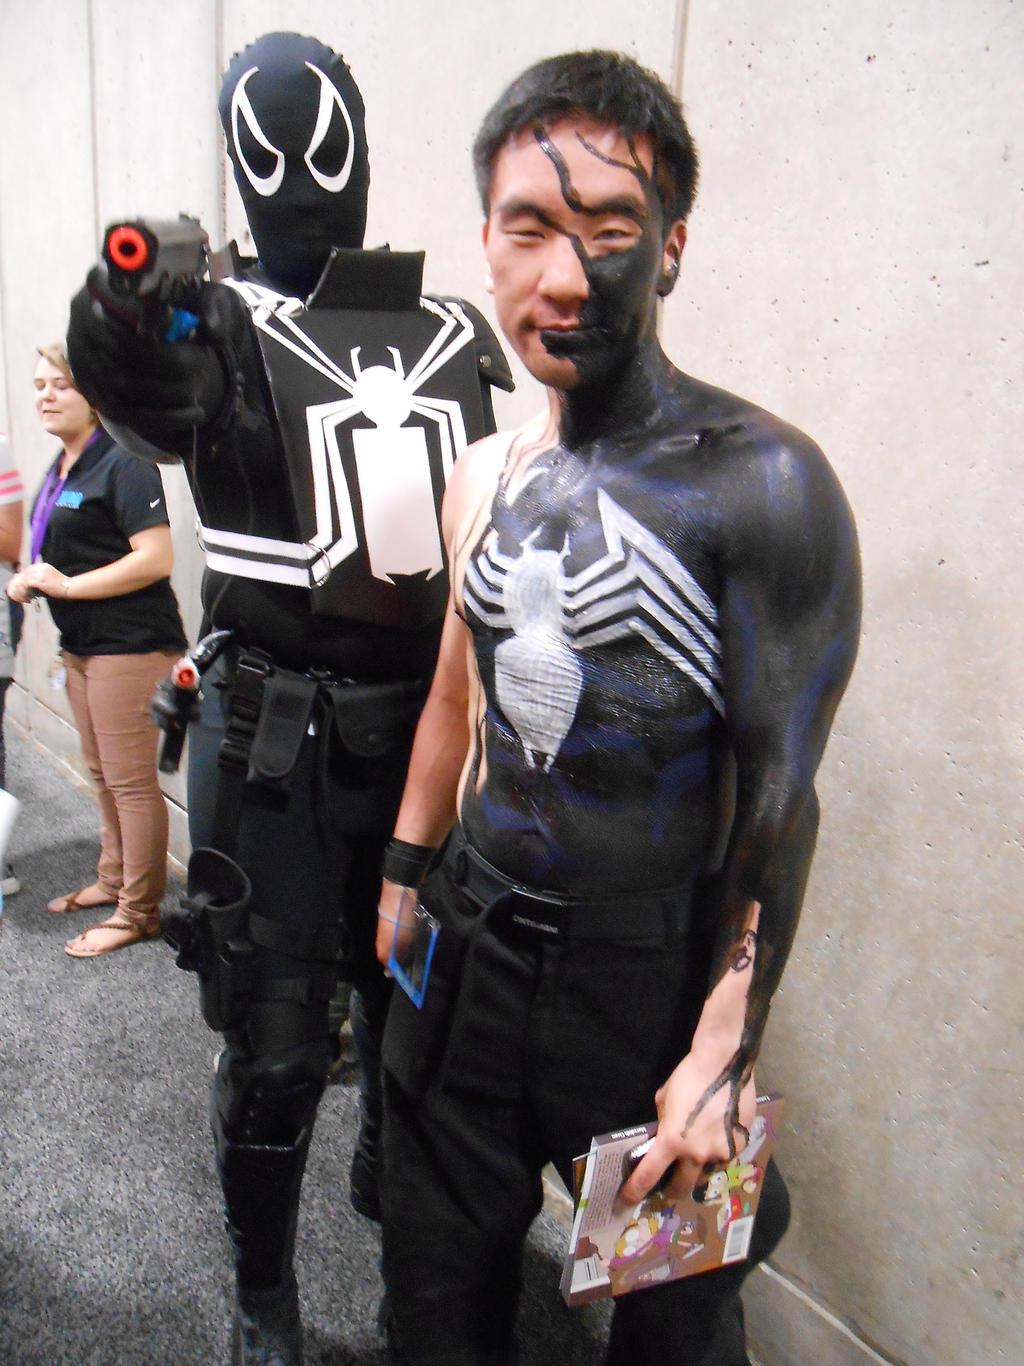 Agent Venom and Venom by pa68 on DeviantArt